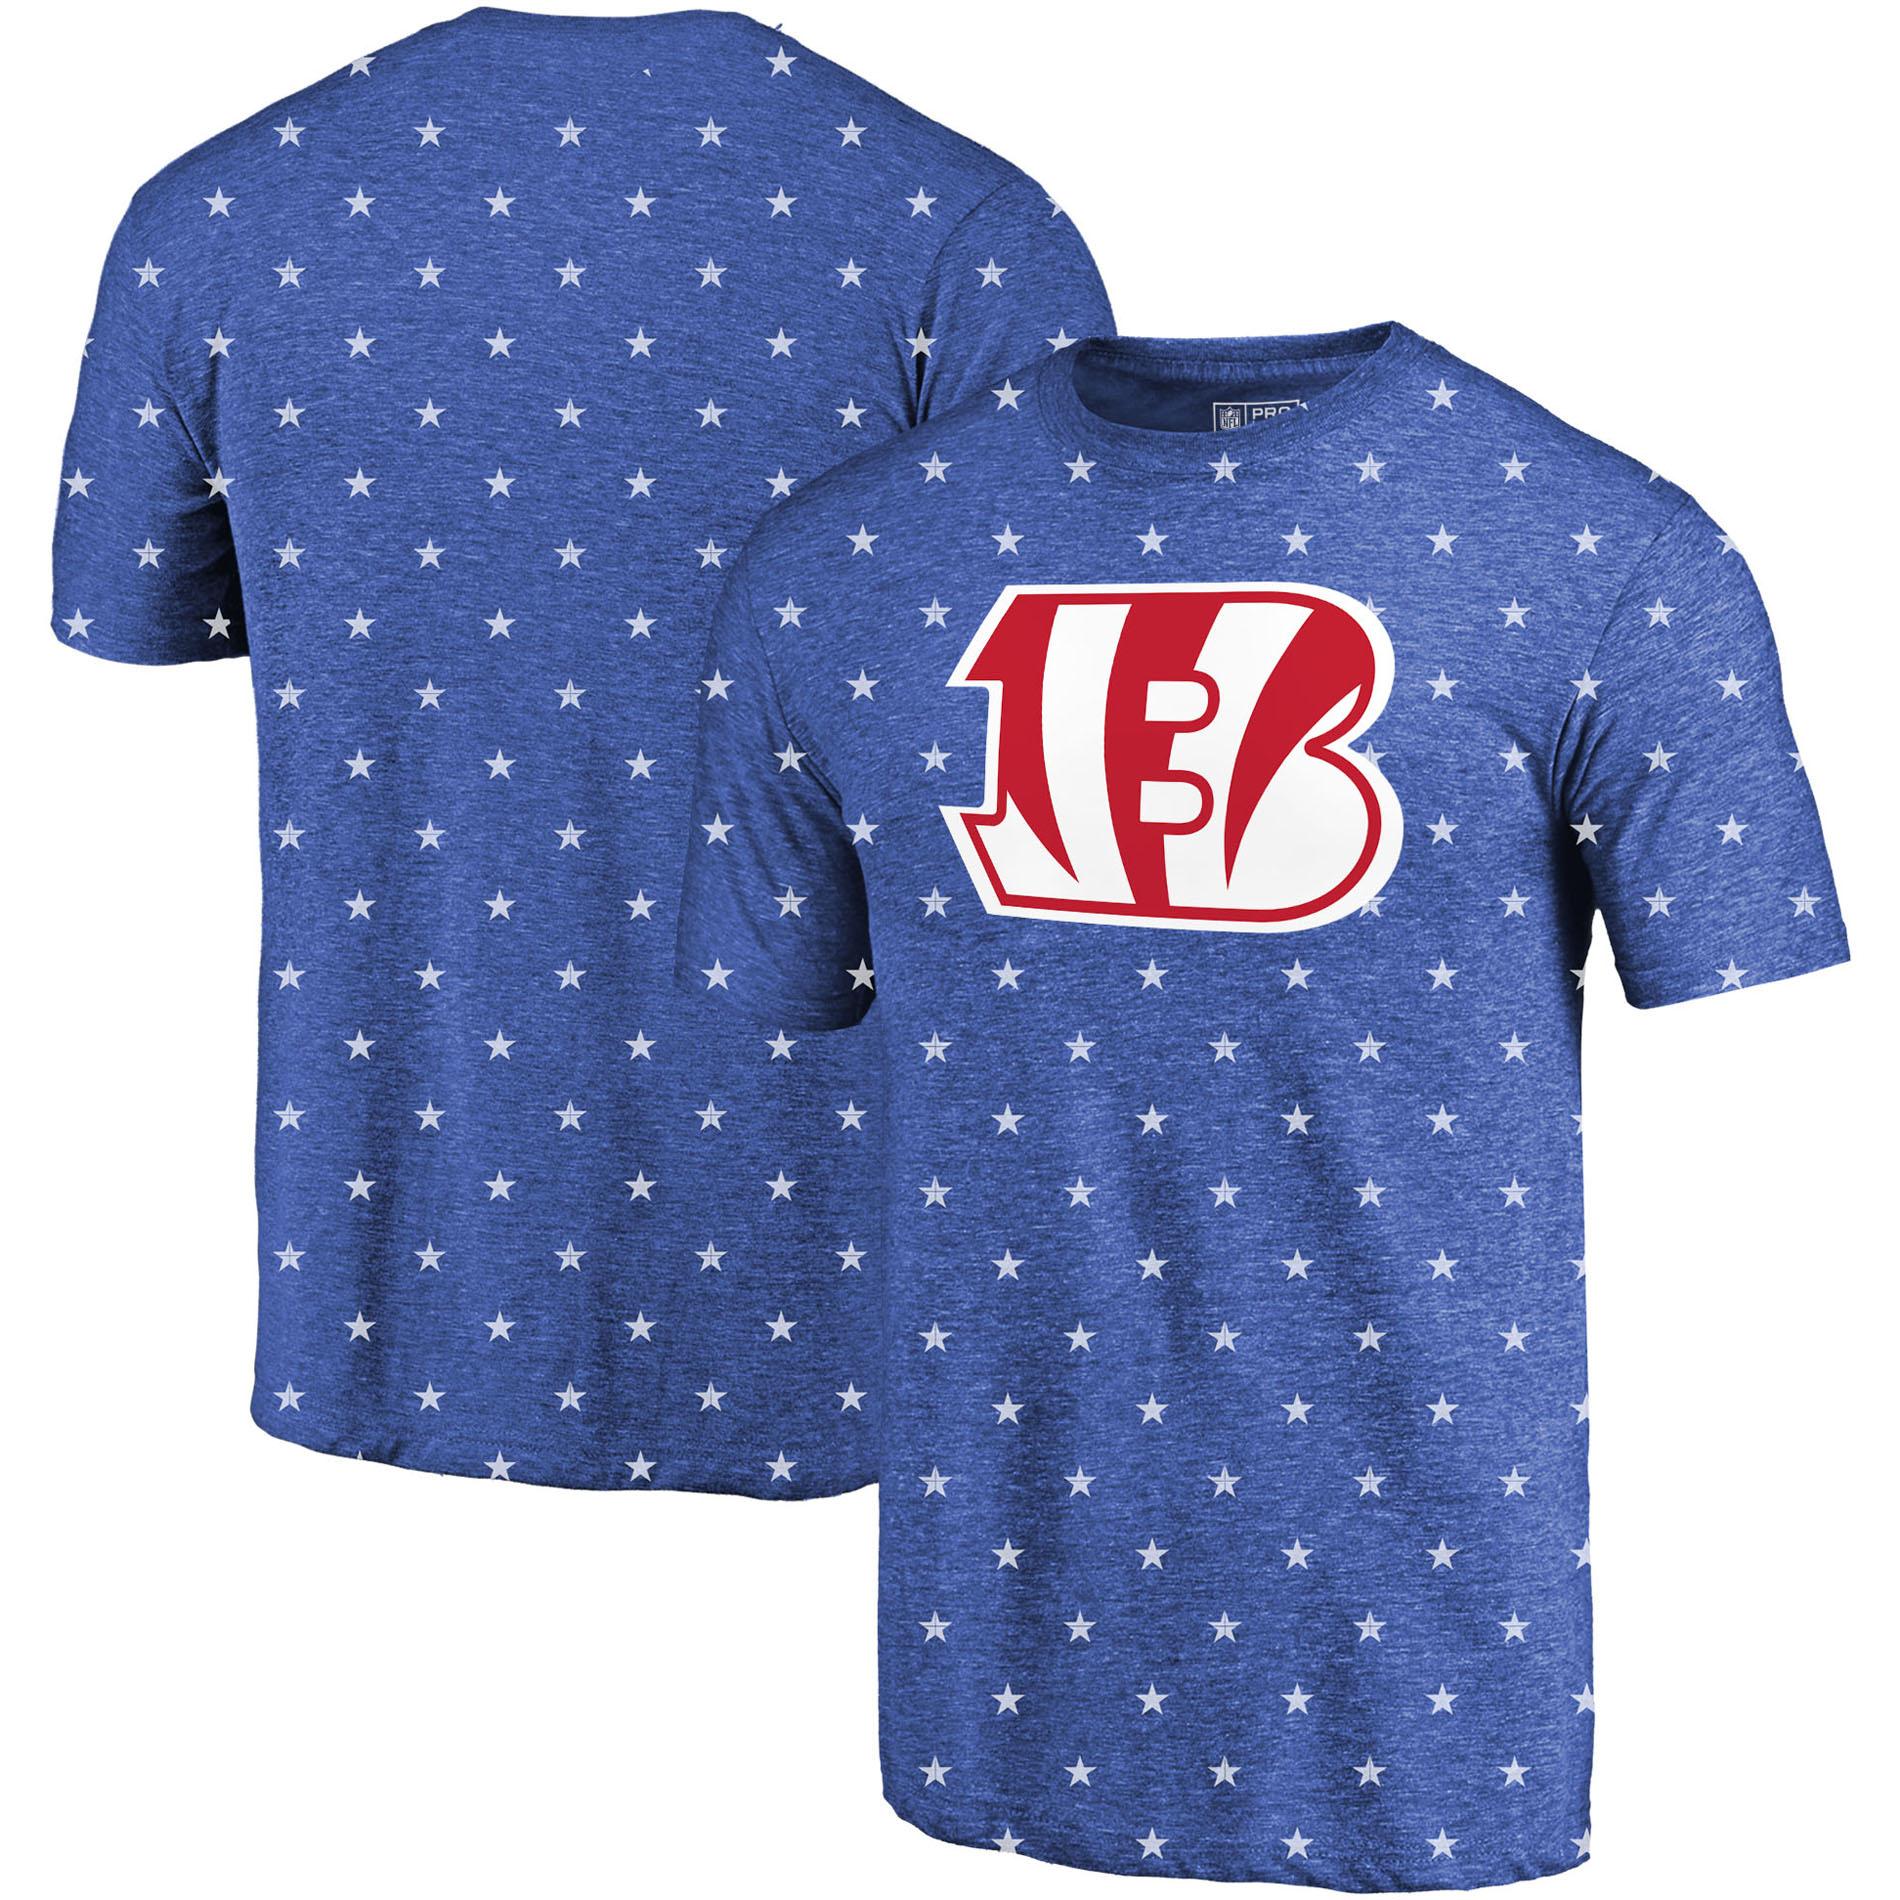 Cincinnati Bengals NFL Pro Line by Fanatics Branded Star Spangled T-Shirt - Royal